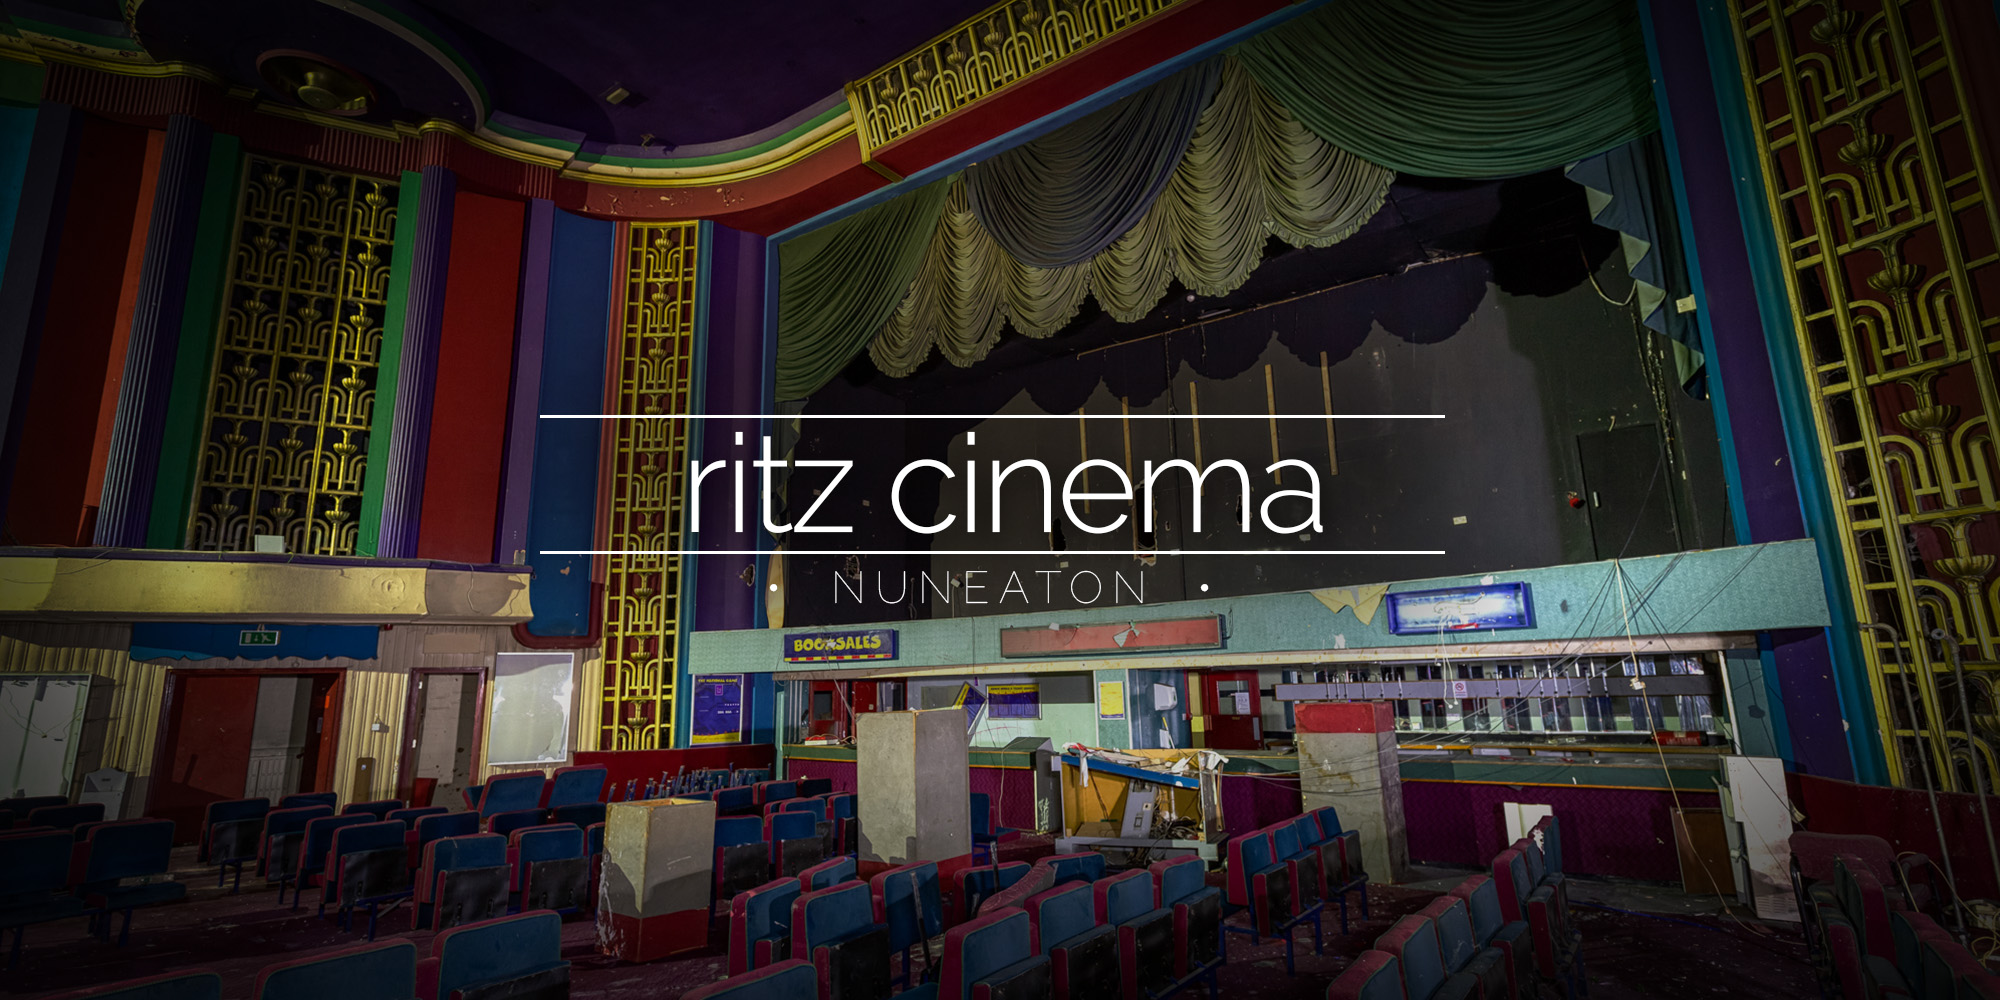 Ritz Cinema, Nuneaton